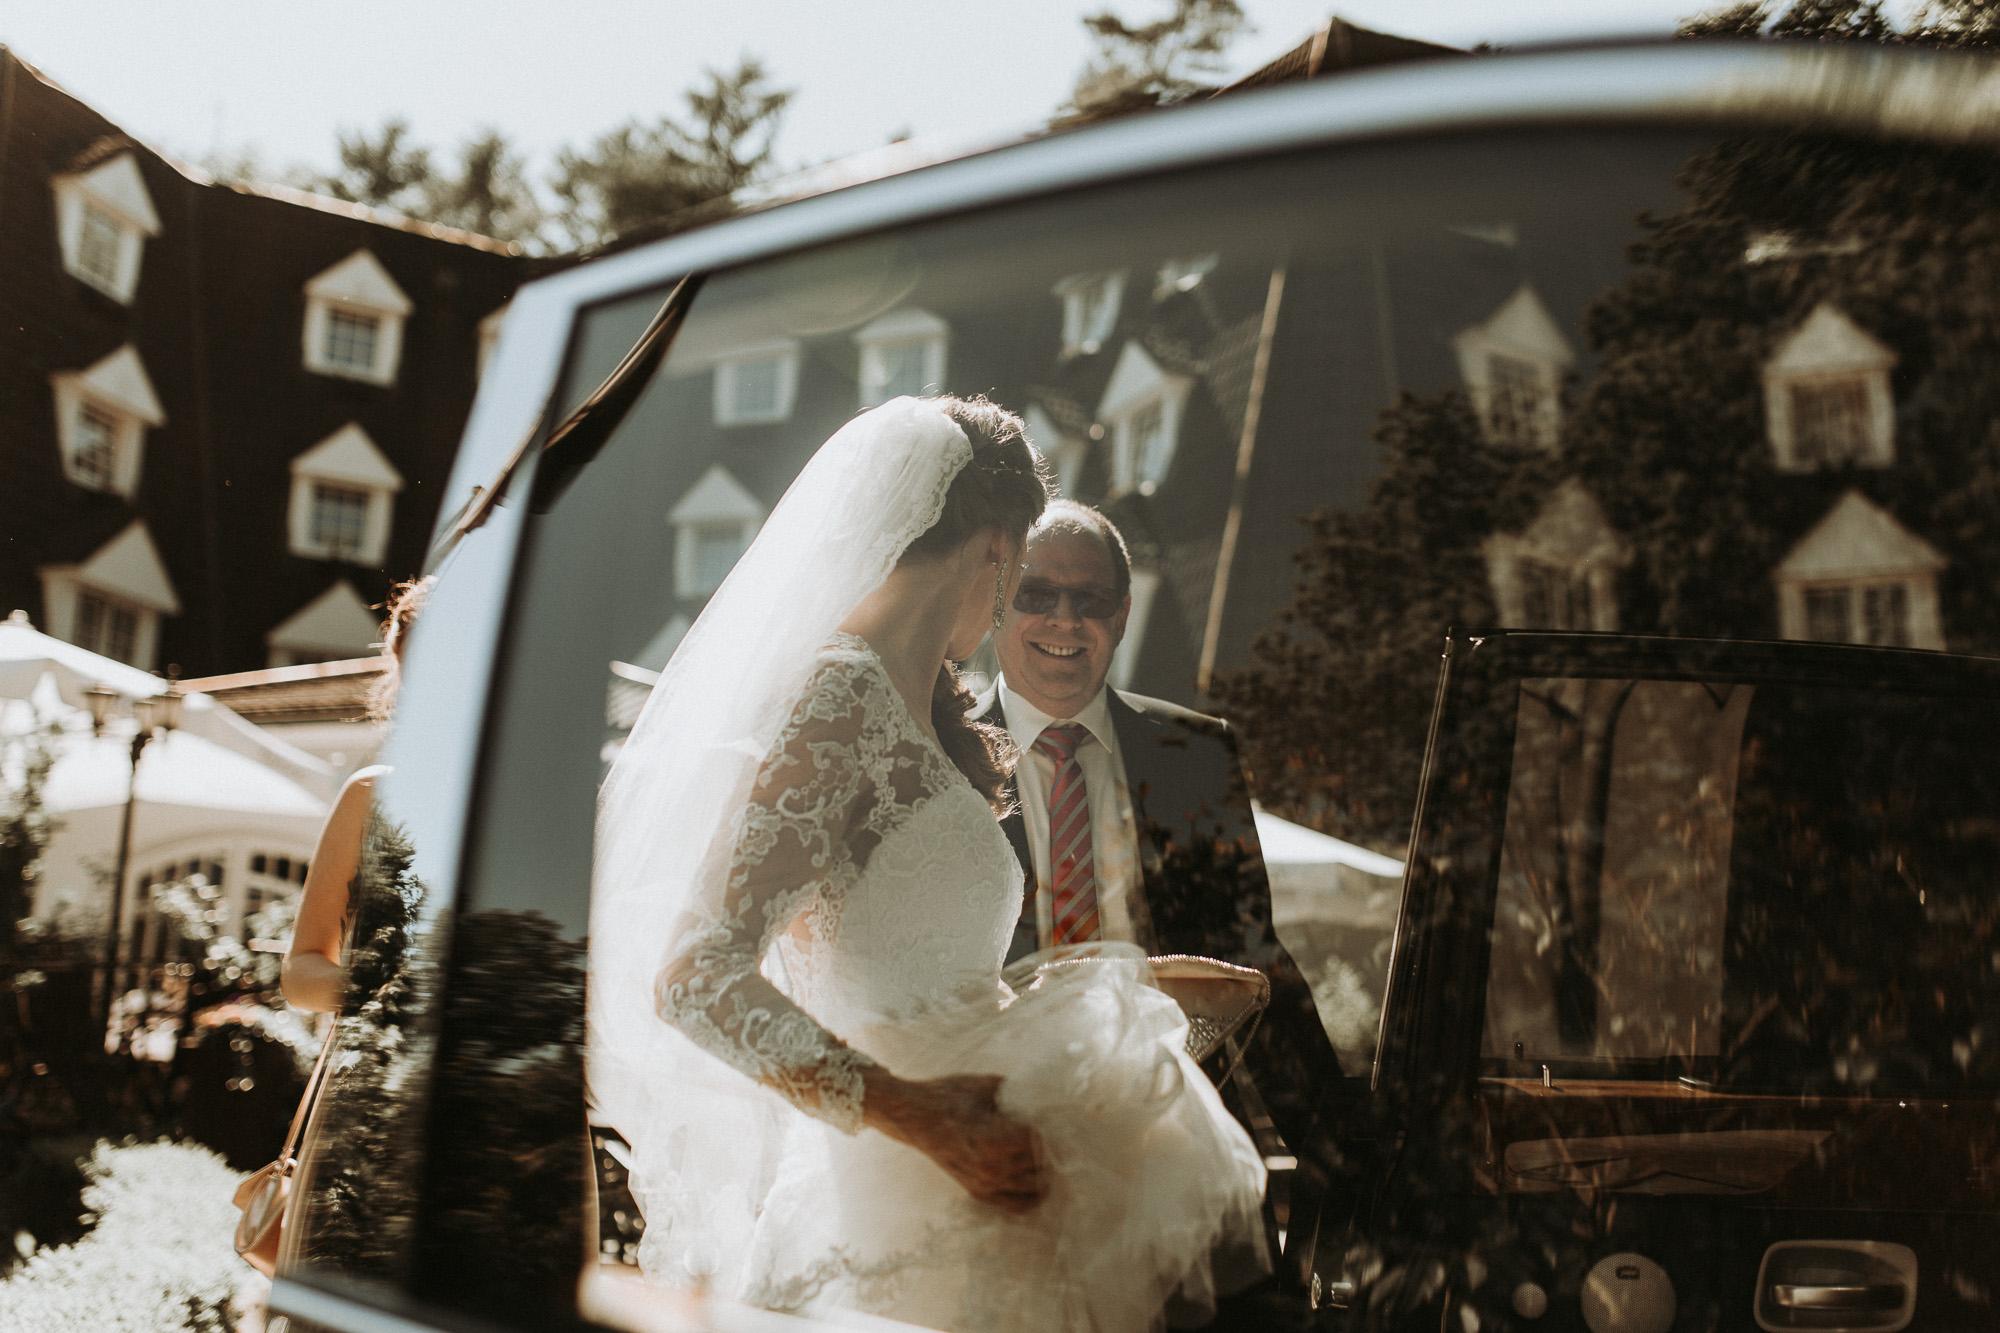 DanielaMarquardtPhotography_Hochzeitsfotograf_Düsseldorf_Köln_Mallorca_Bayern_Austria_Harz_Wedding_AileenundLennart_Weddingphotographer_Ibiza_Tuskany_Italien_Toskana_Portugal_Lissabon60